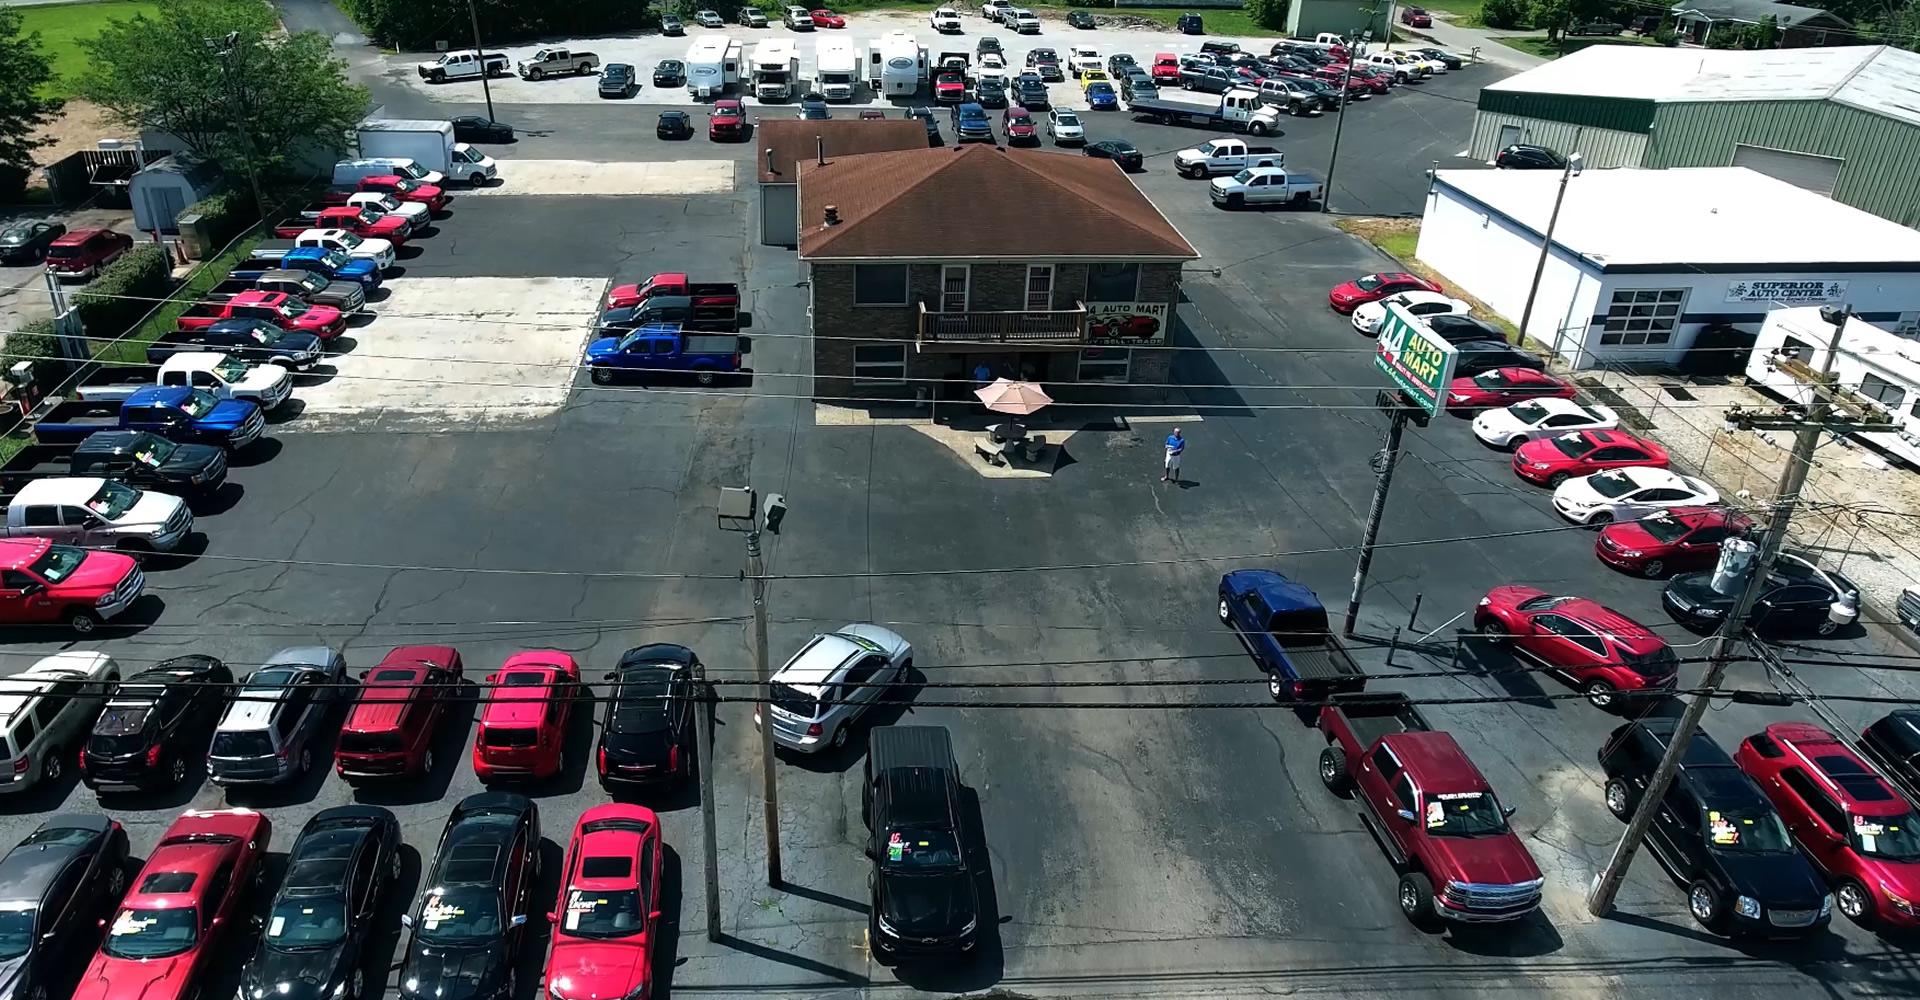 Cars For Sale Louisville Ky >> 44 Auto Mart Shepherdsville Louisville Ky New Used